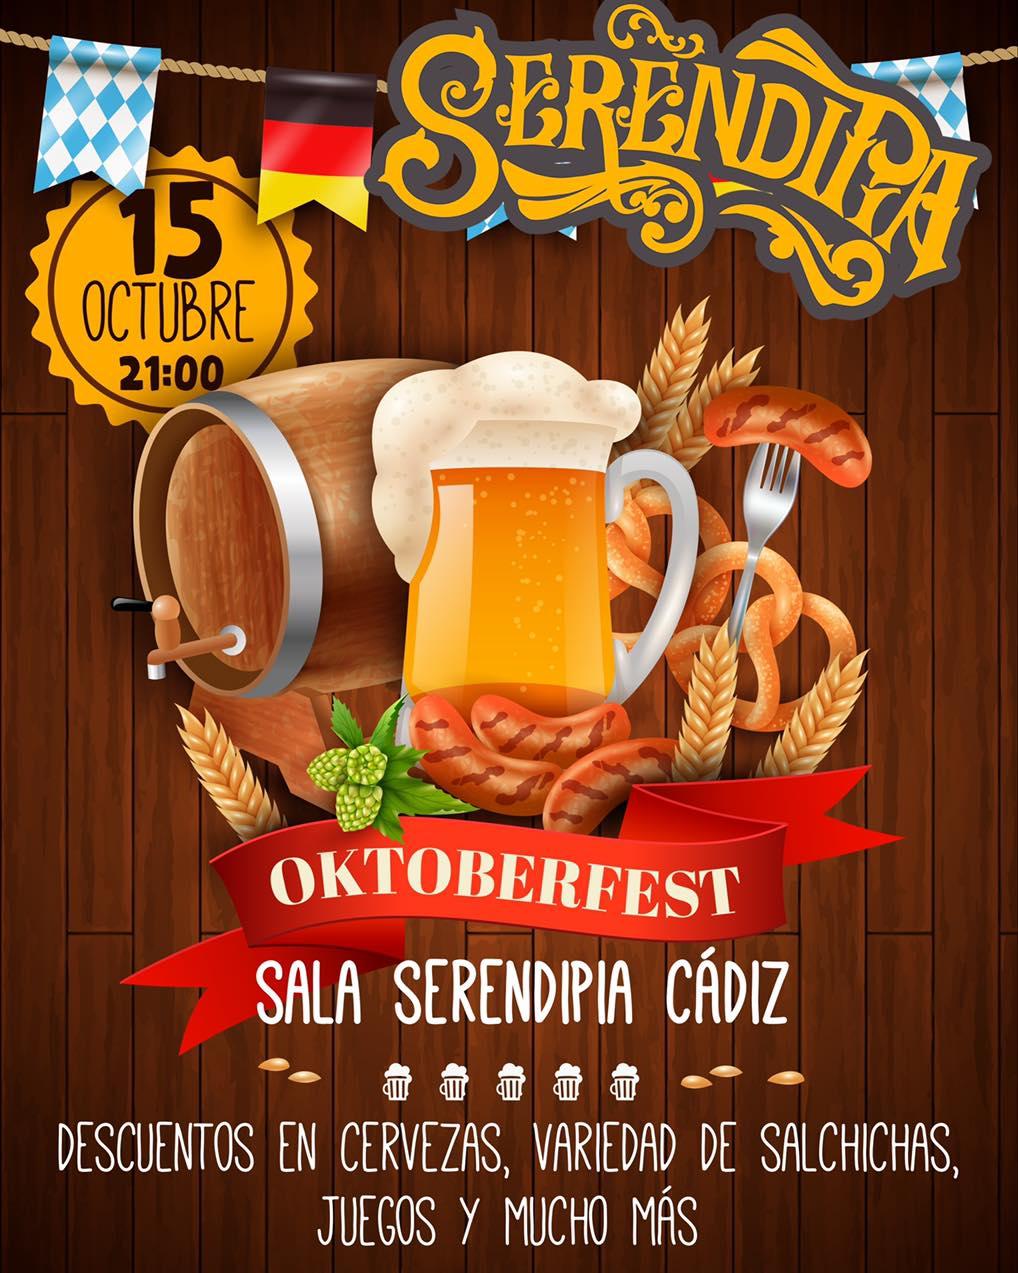 Oktoberfest en Serendipia